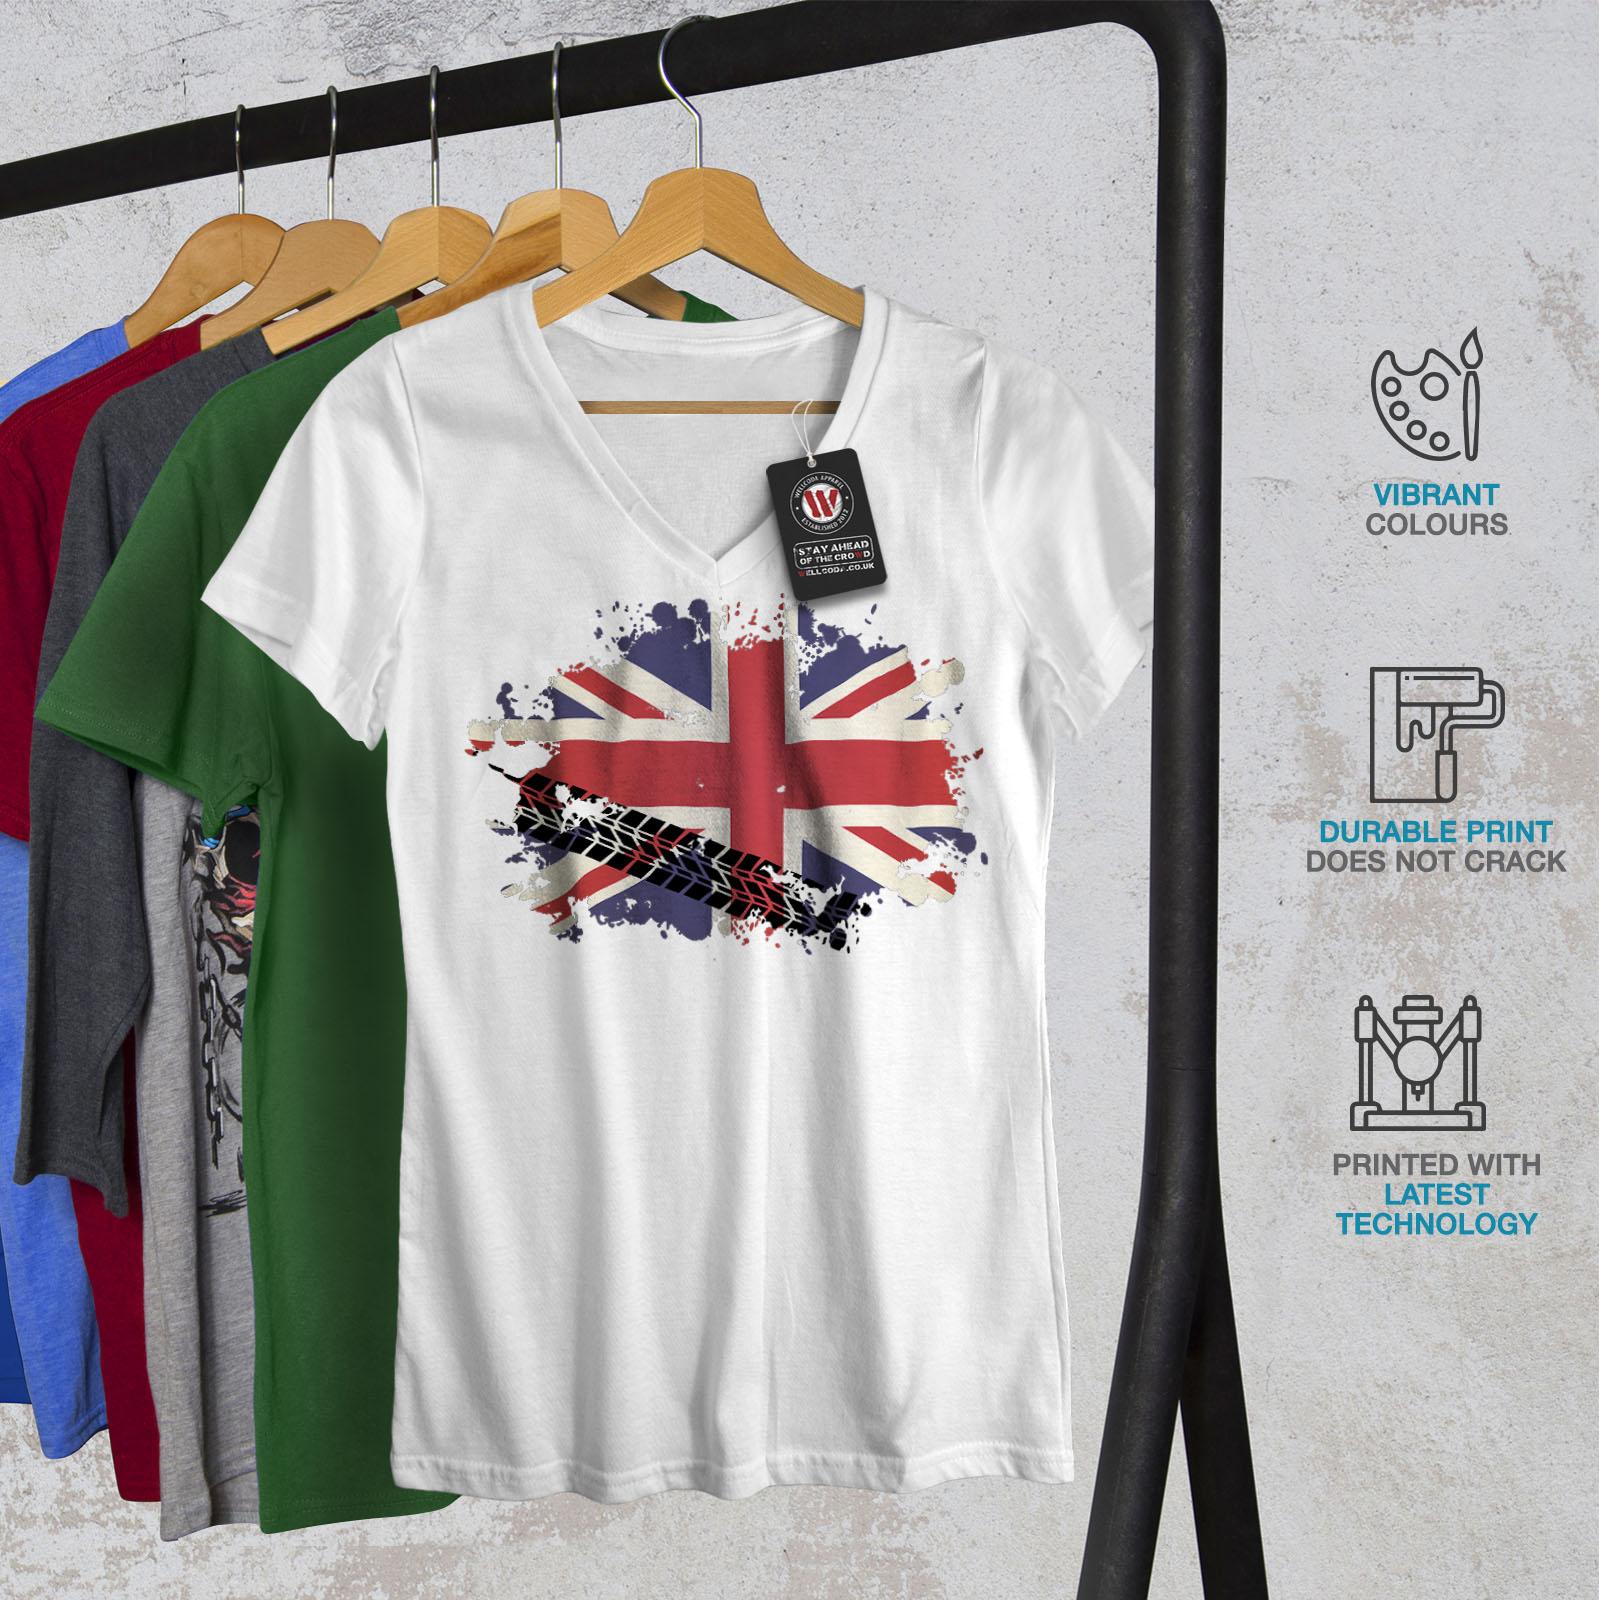 Wellcoda-Union-Jack-Drapeau-Femme-T-Shirt-col-V-la-Grande-Bretagne-conception-graphique-Tee miniature 8